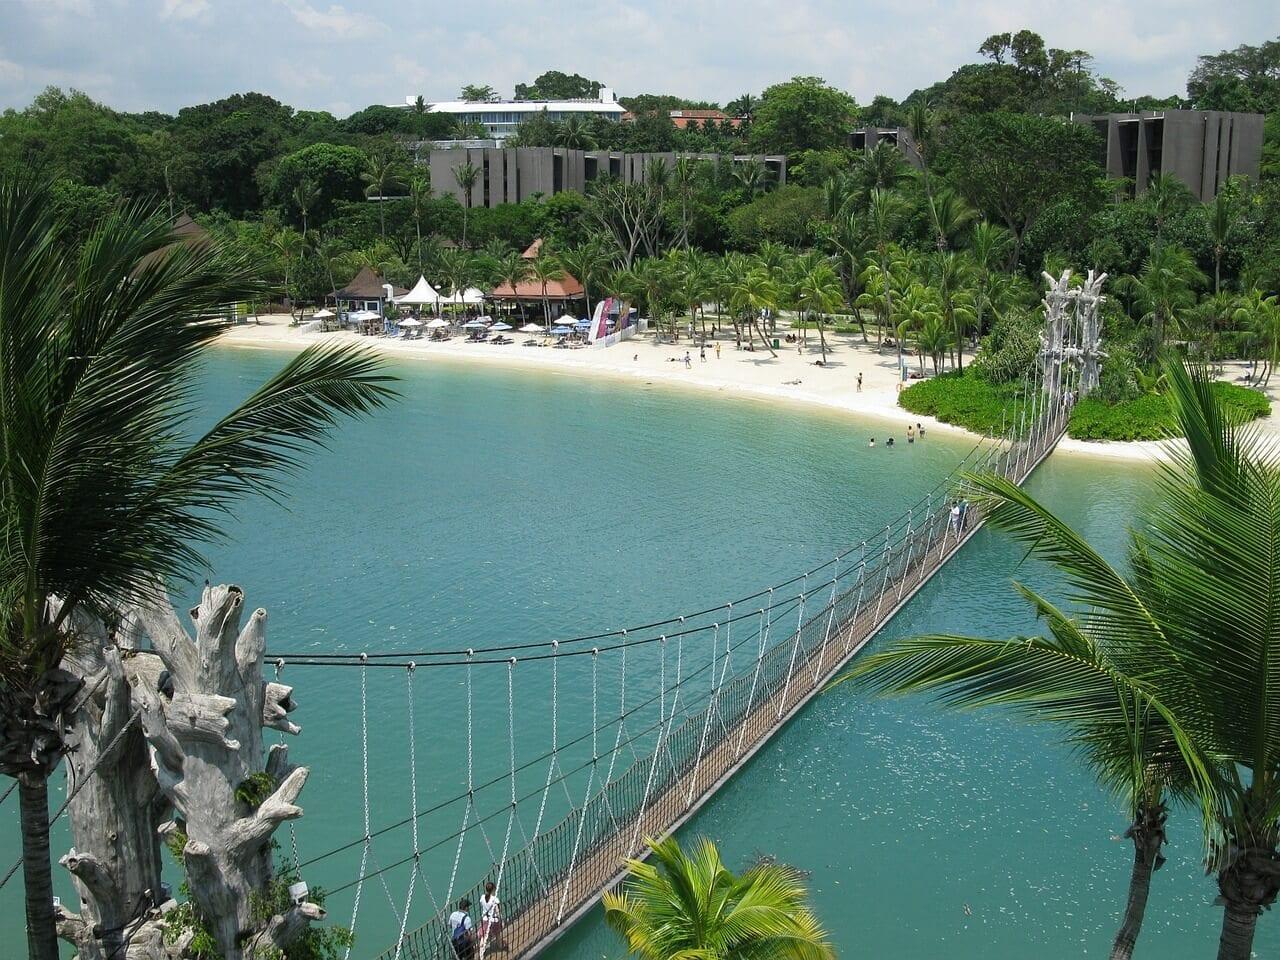 Sentosa was originally called Pulau Blakang Mati